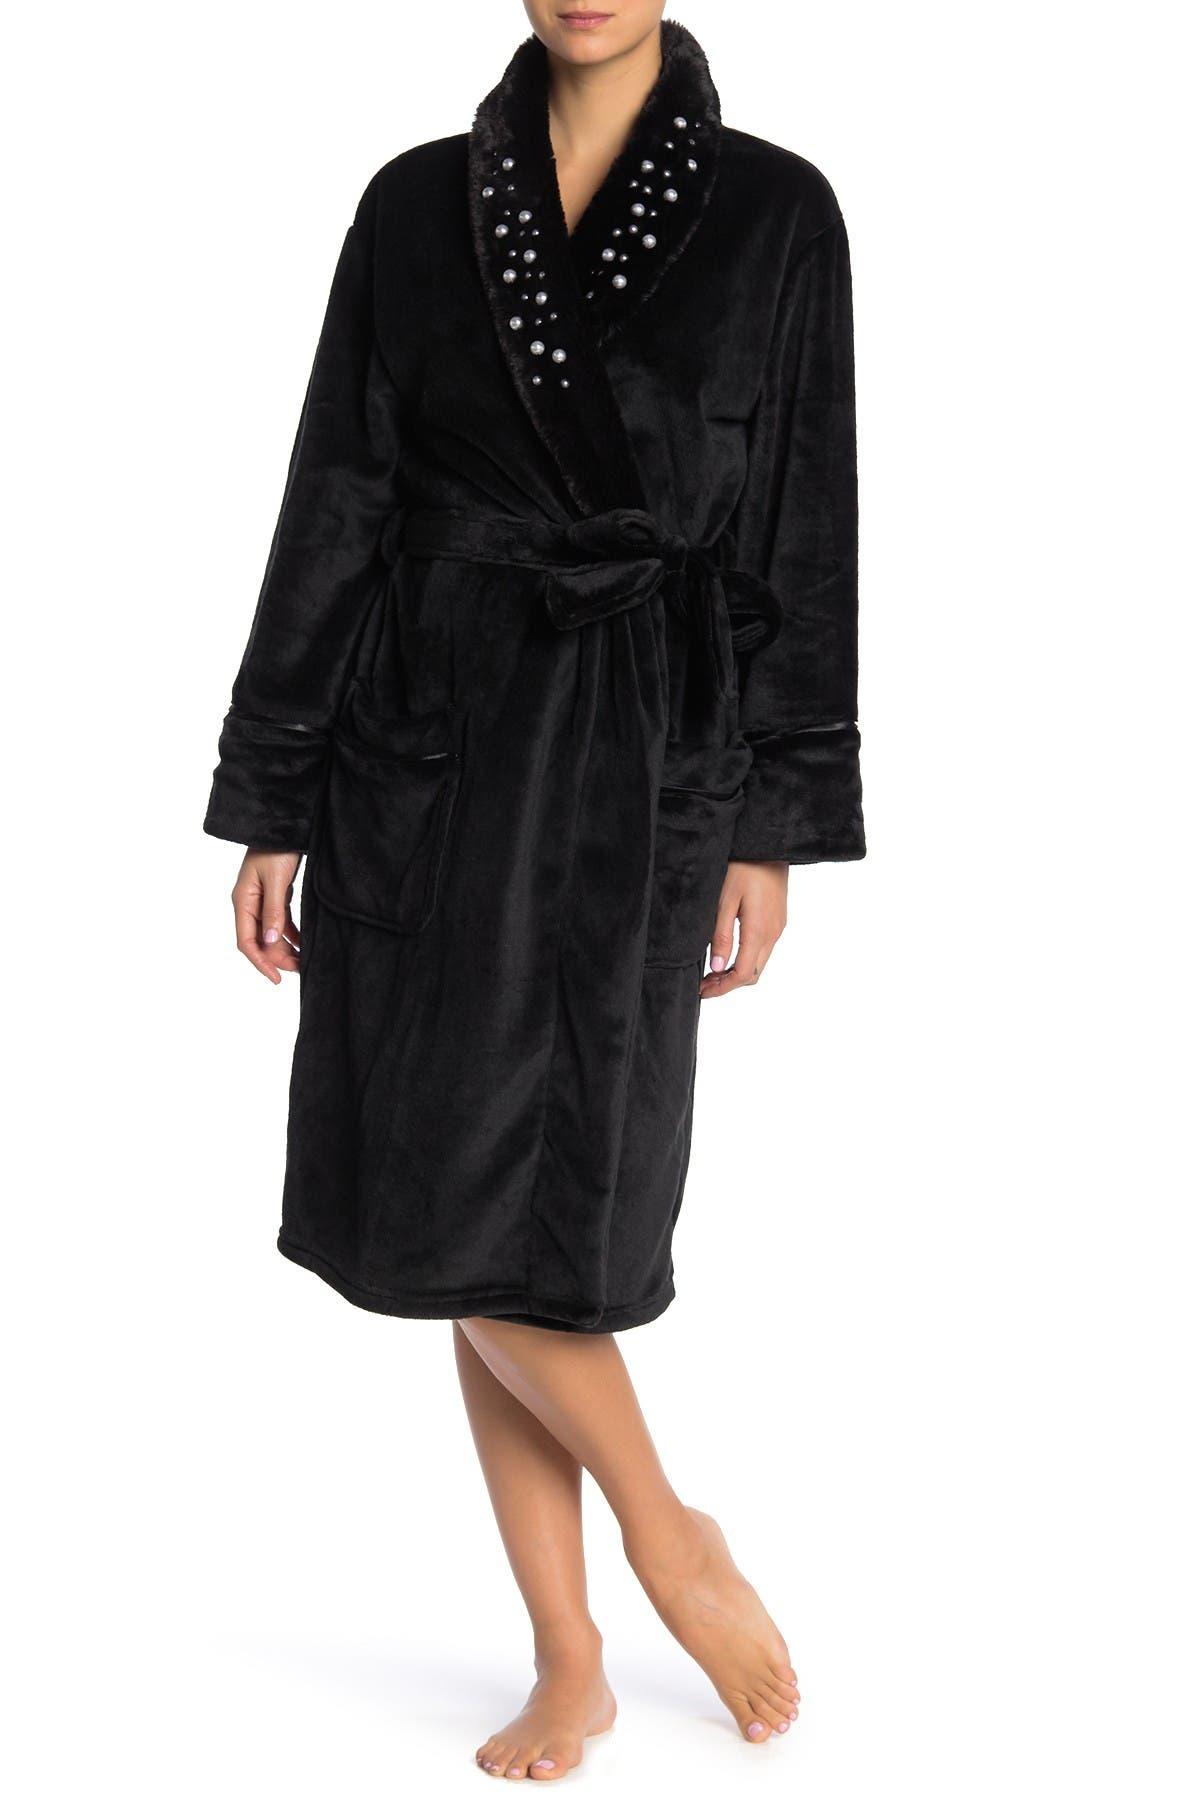 Image of PJ SALVAGE Luxe Affair Faux Fur Pearl Stud Robe